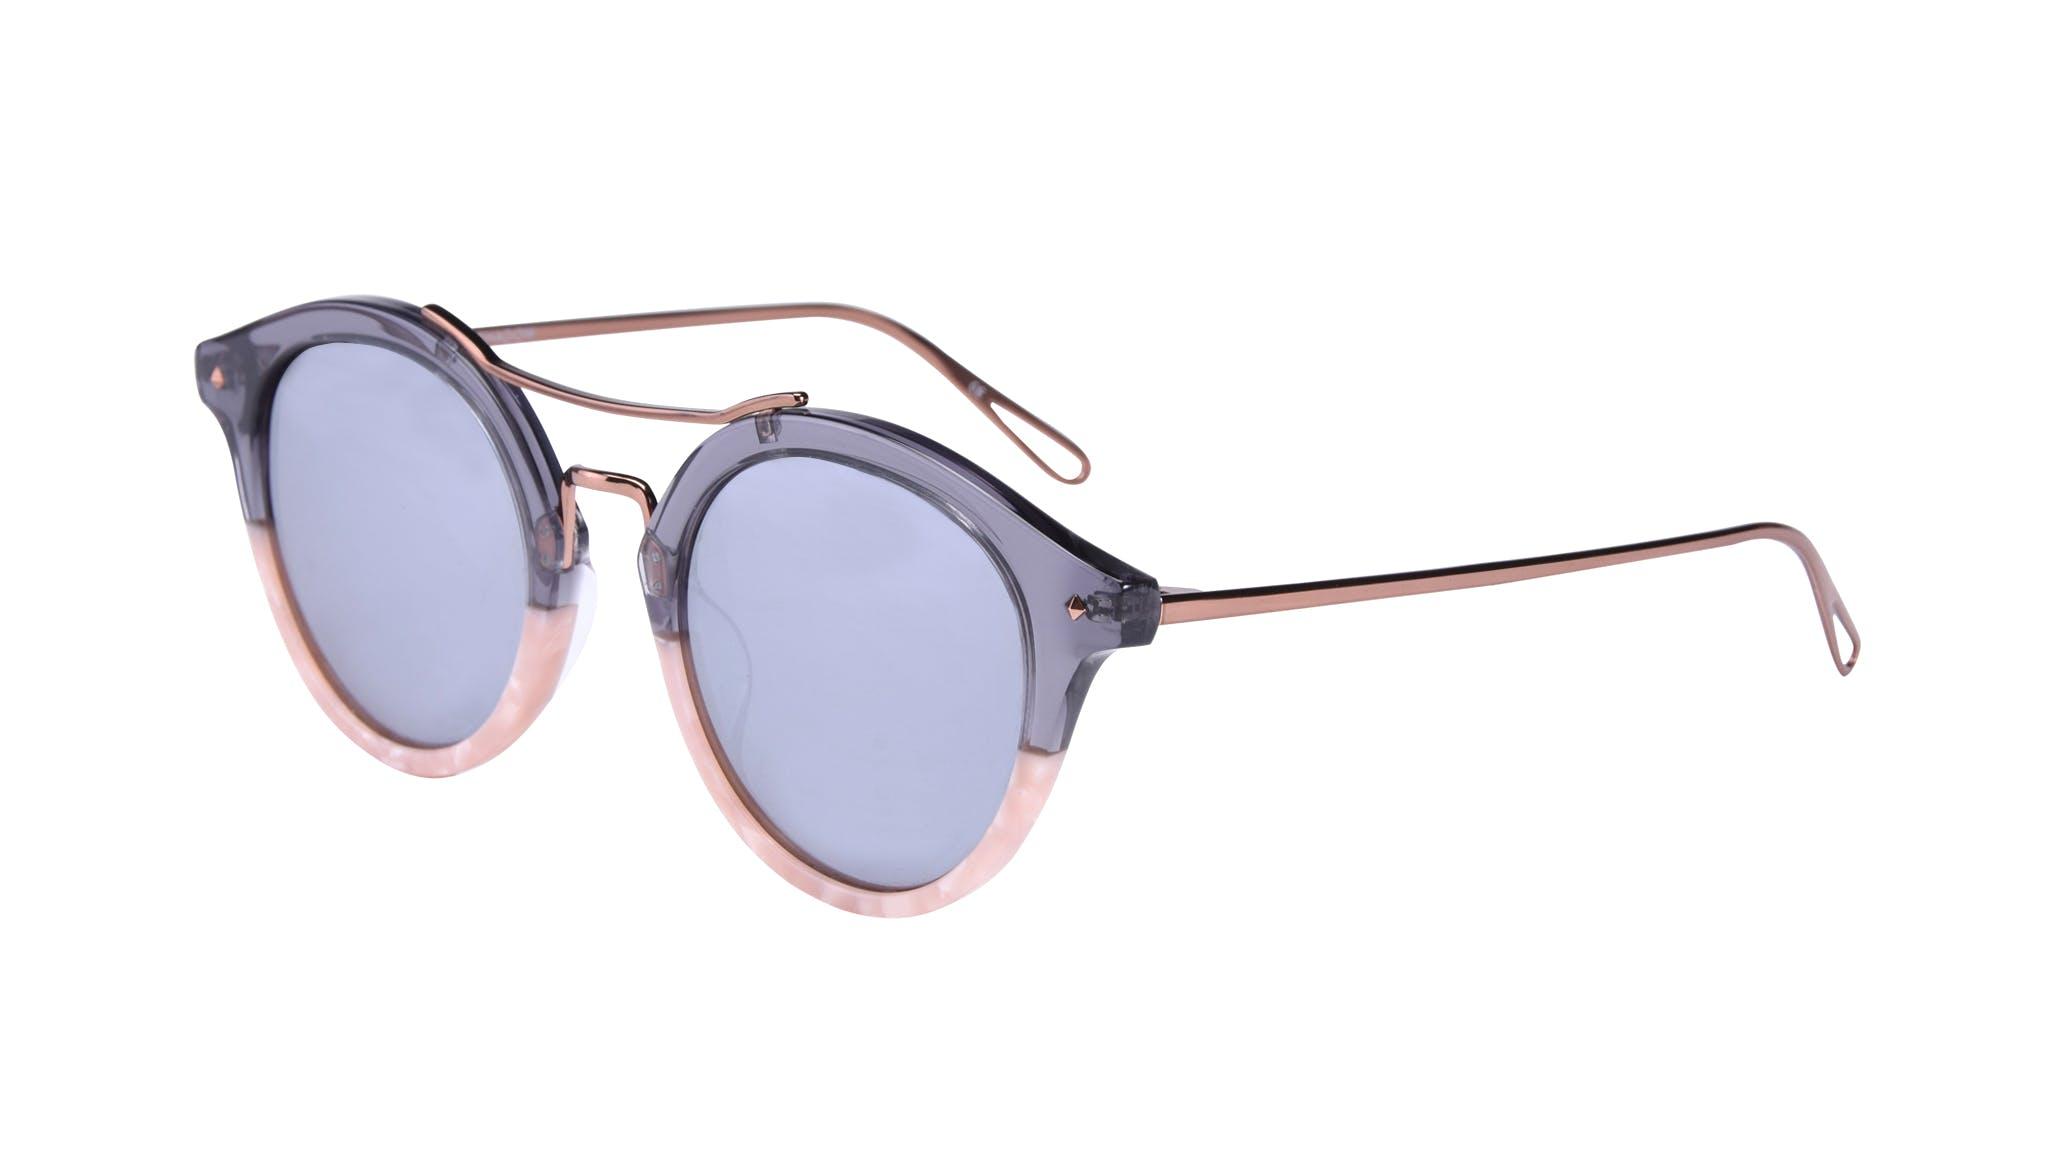 Affordable Fashion Glasses Round Sunglasses Women Infinite Rose Shadow Tilt